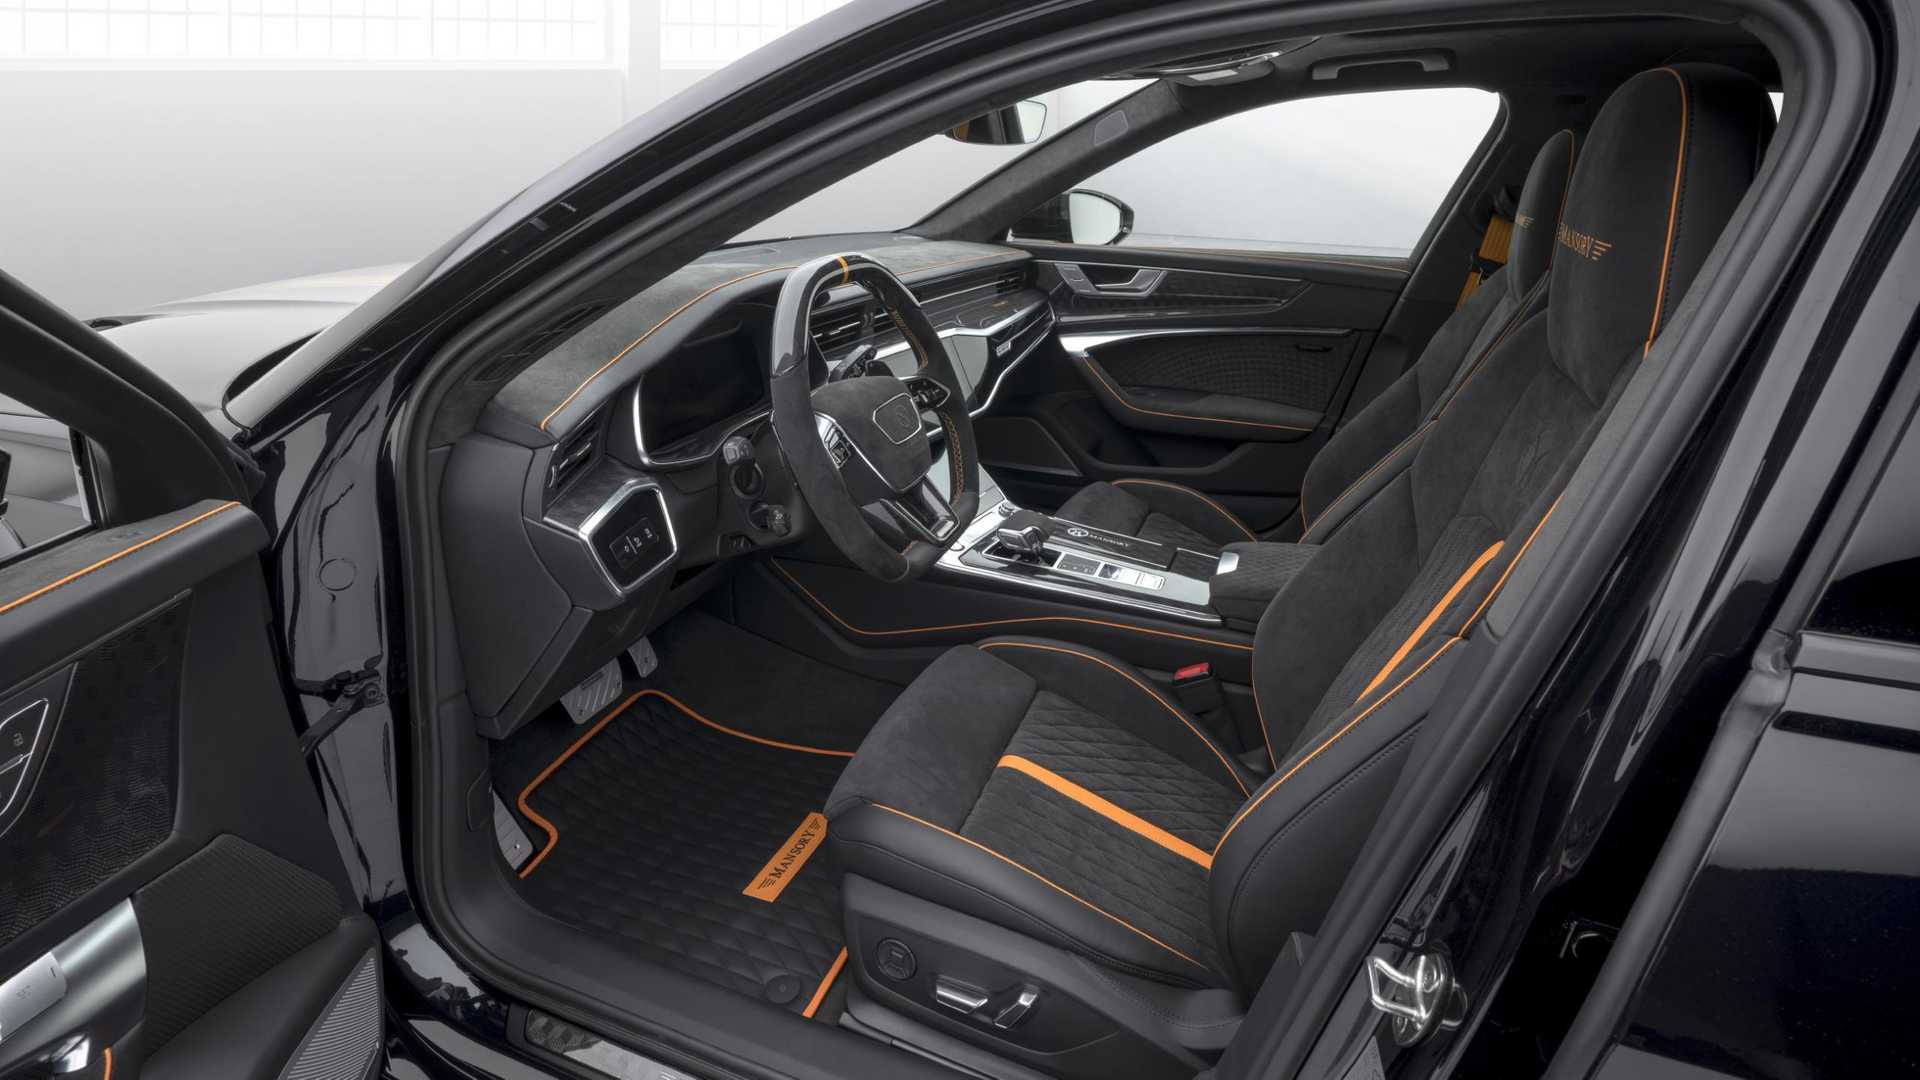 2015 Kitzbuhel Audi Home of quattro 317 600x300 photo